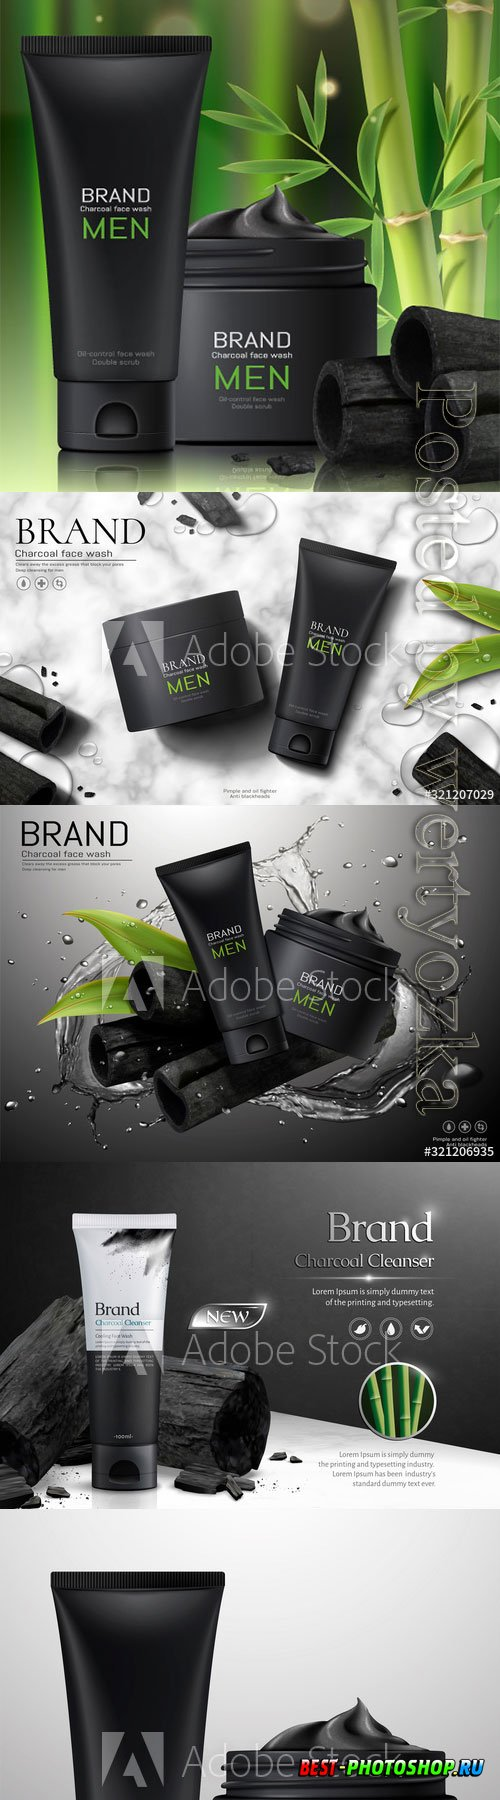 Charcoal men face wash ads